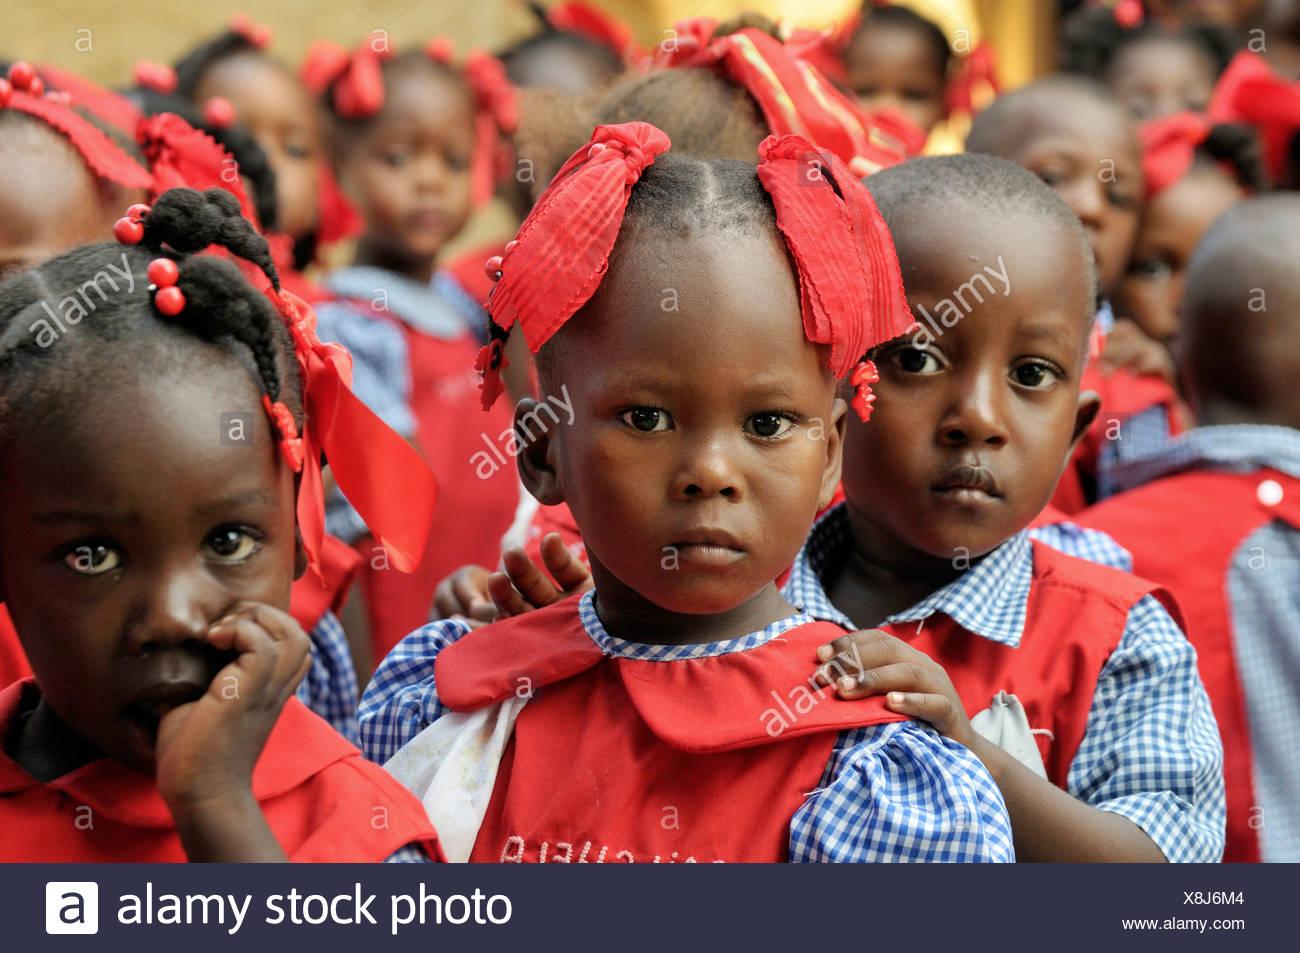 Children wearing school uniforms in a preschool in Leogane, Haiti, Caribbean, Central America - Stock Image